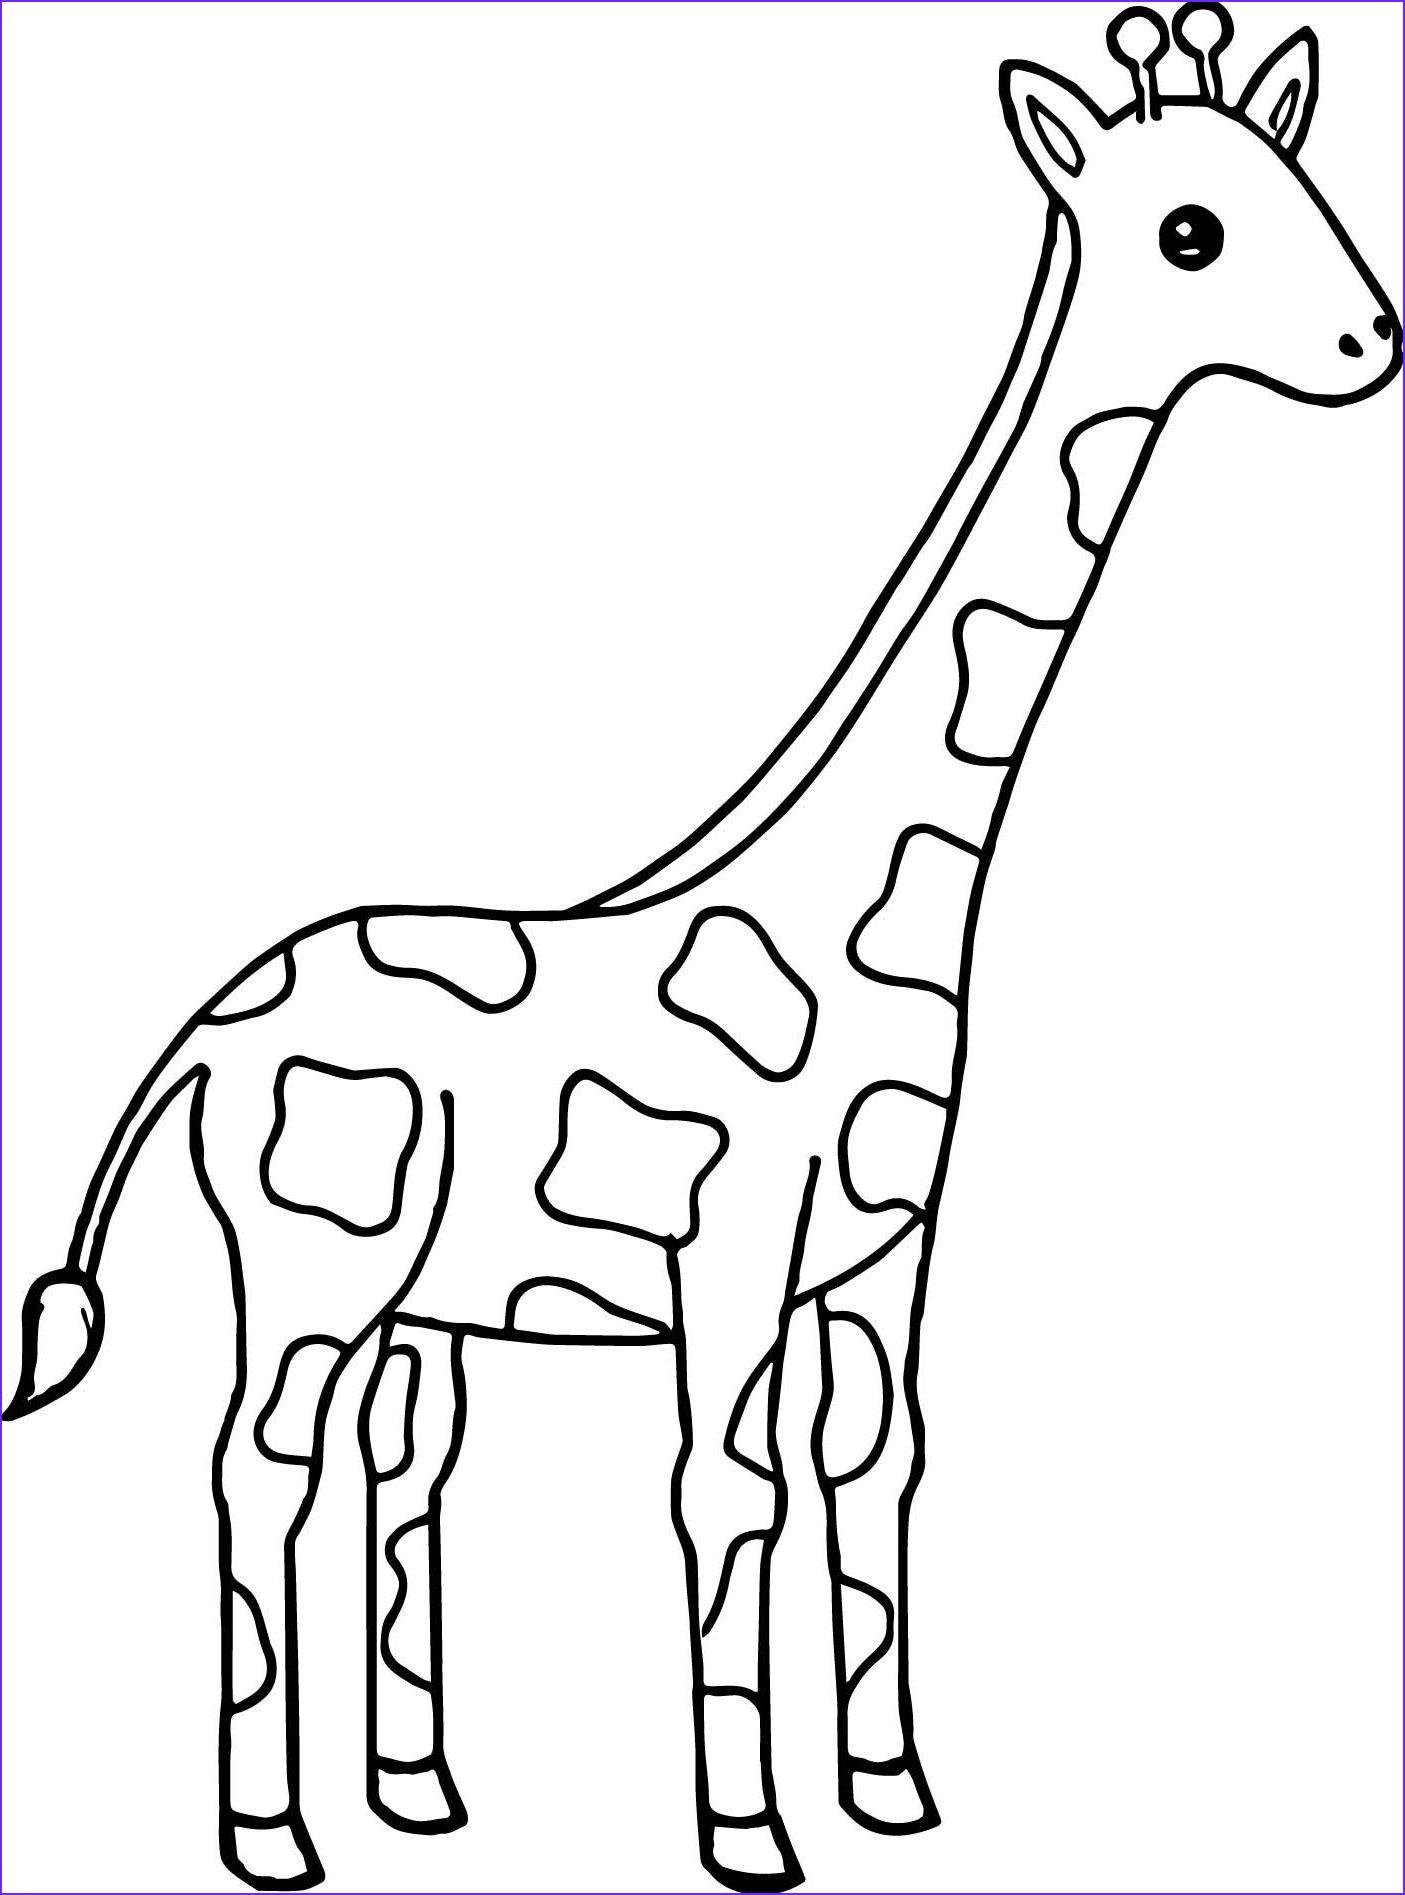 Nice Tall Giraffe Coloring Page Wecoloringpage In